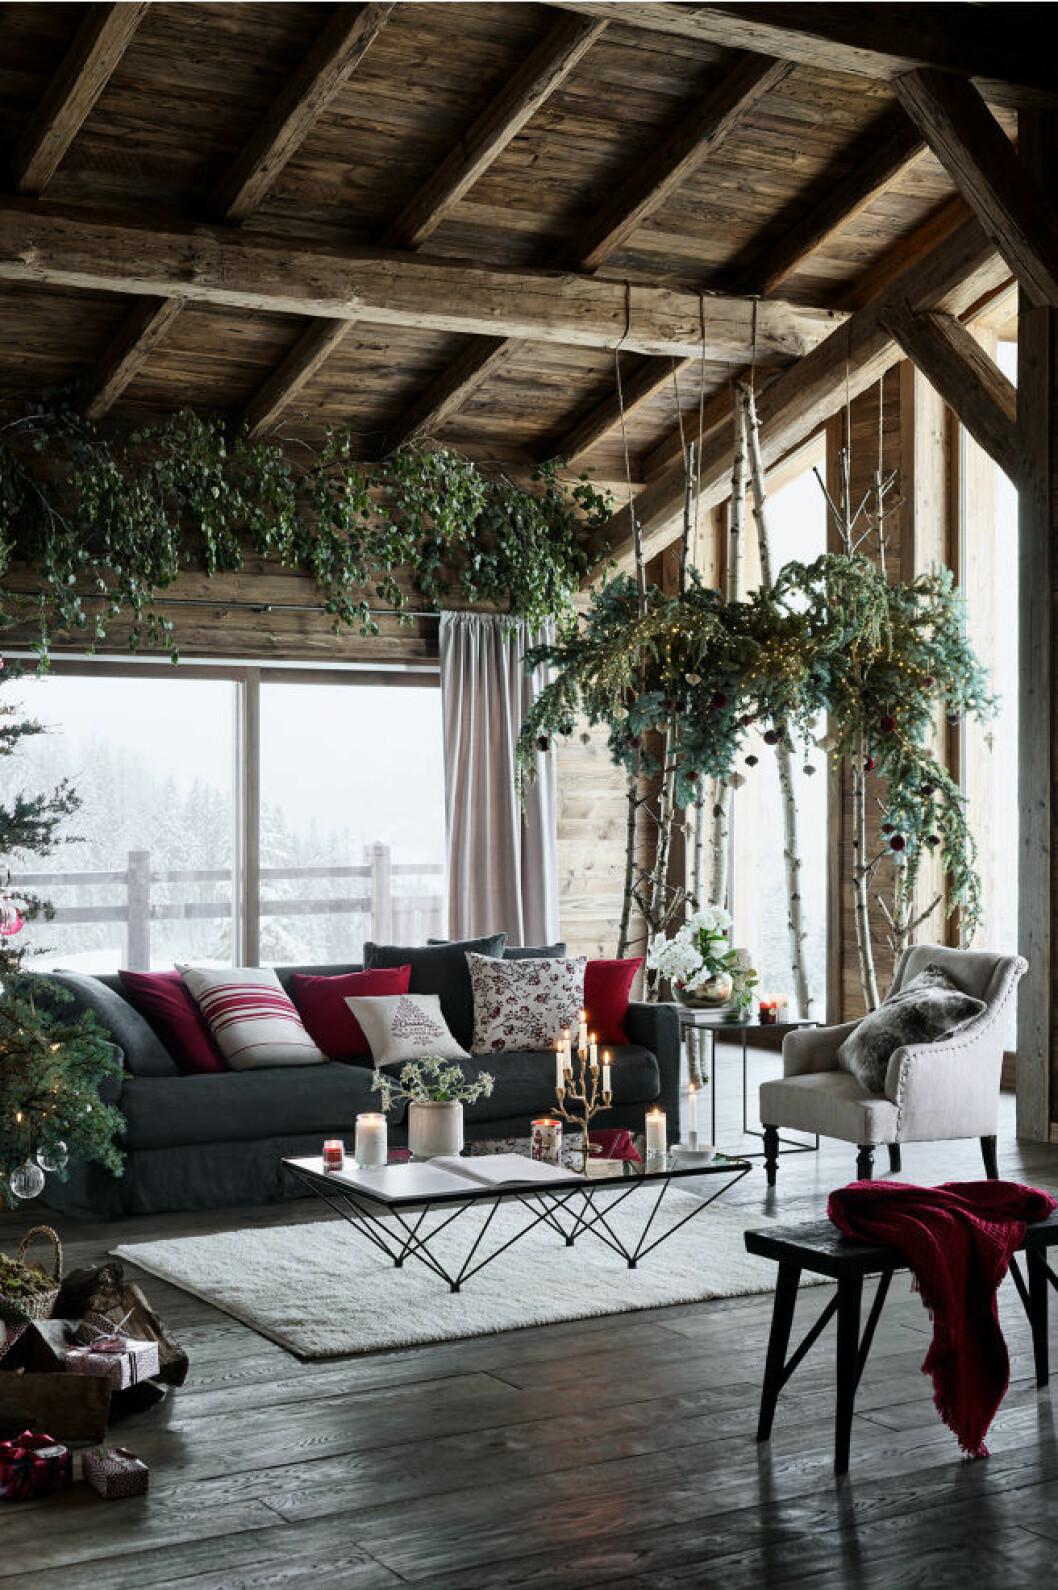 hm home jul vardagsrum